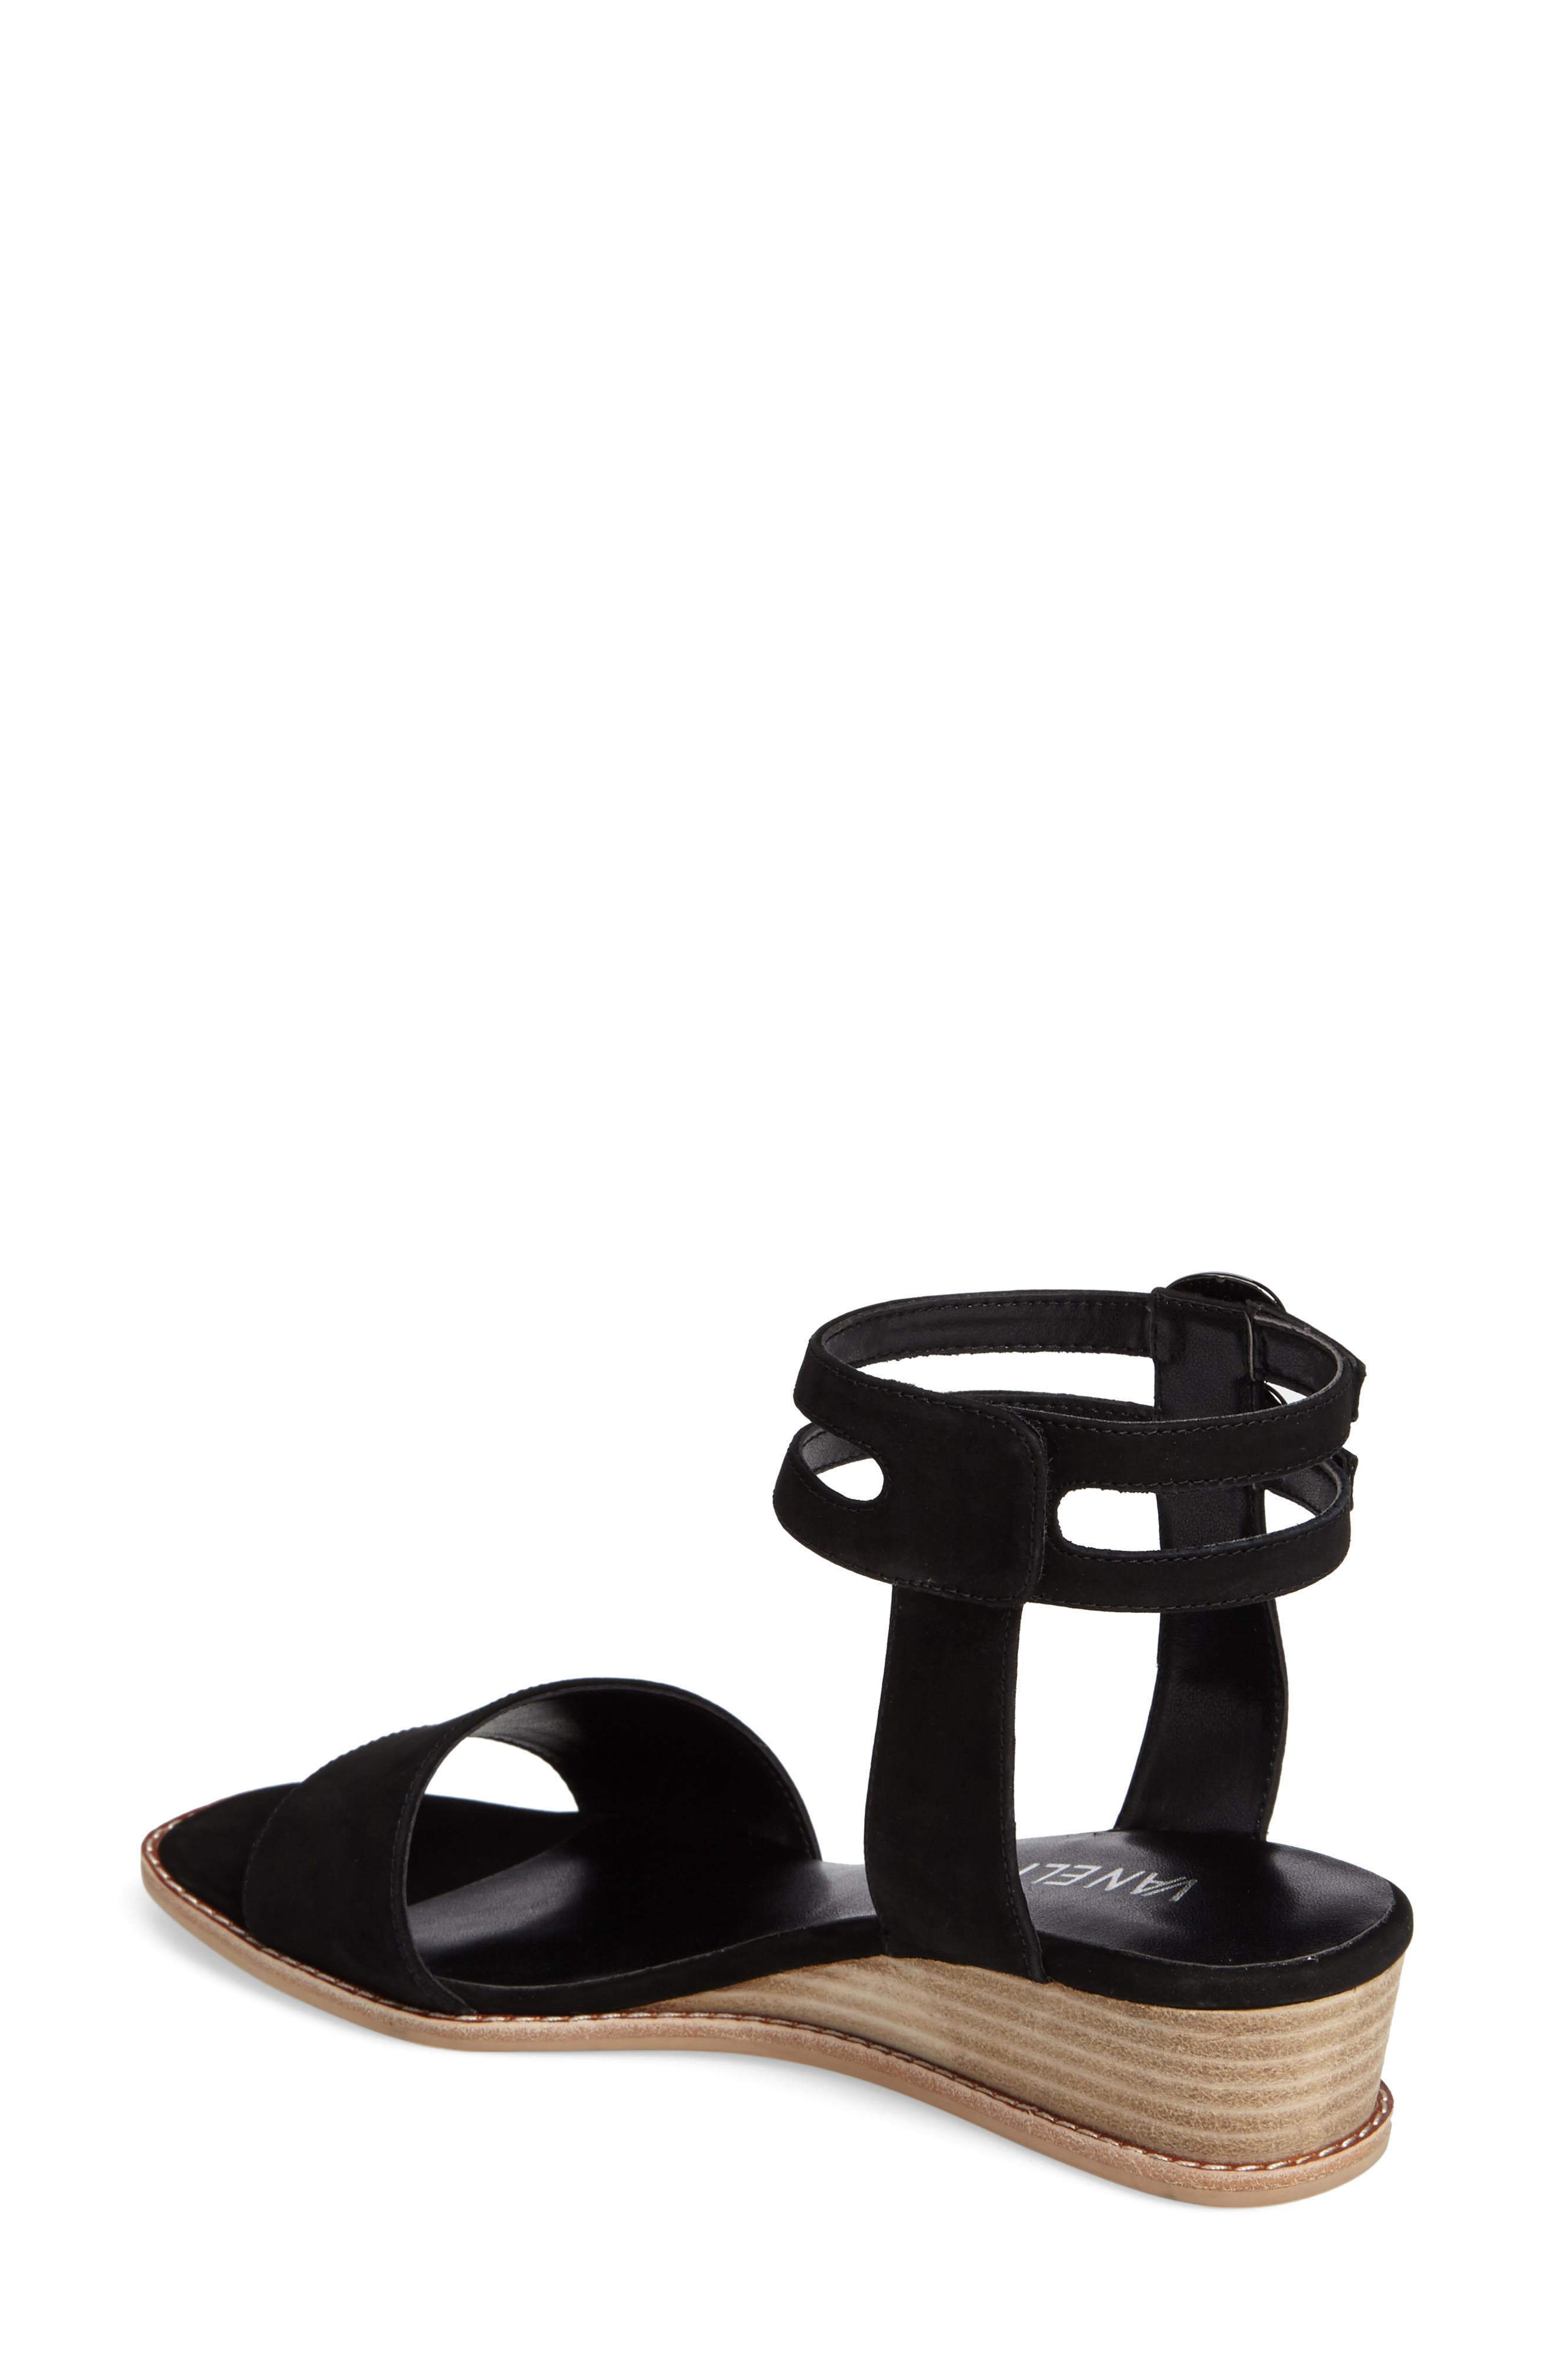 Jarita Ankle Strap Sandal,                             Alternate thumbnail 2, color,                             001